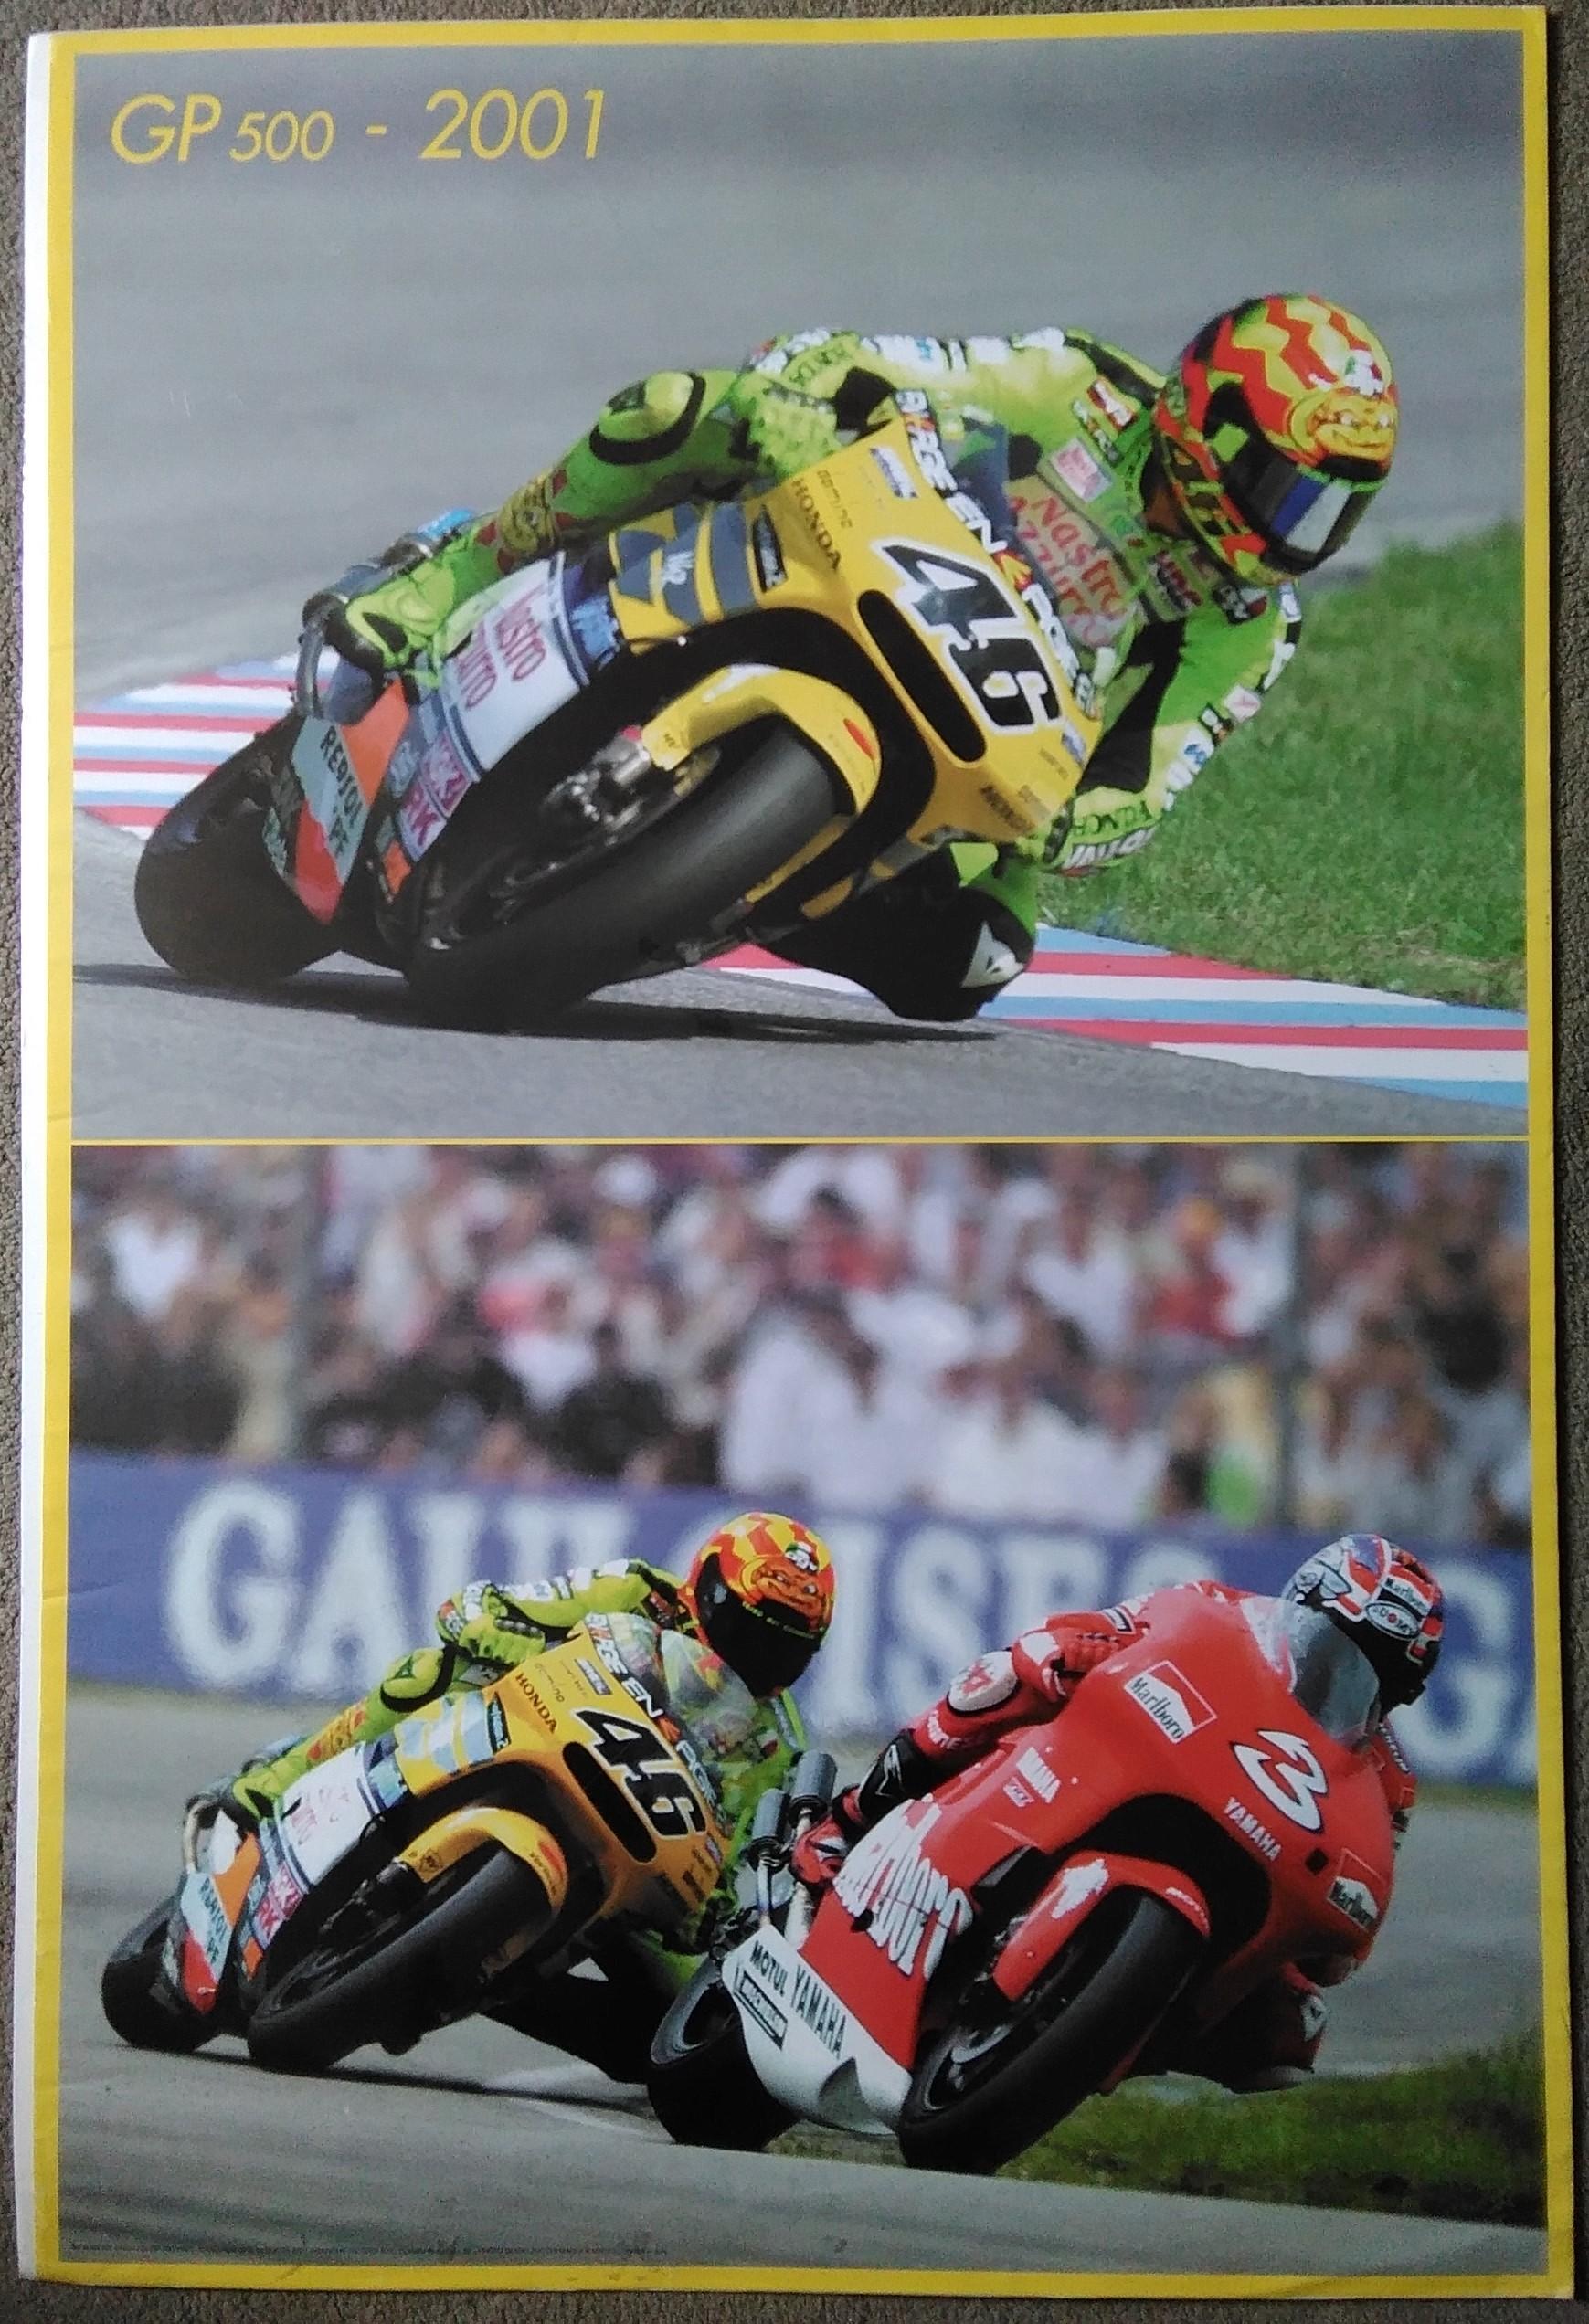 Rossi/Biaggi-Rossi 2001 500GP Poster